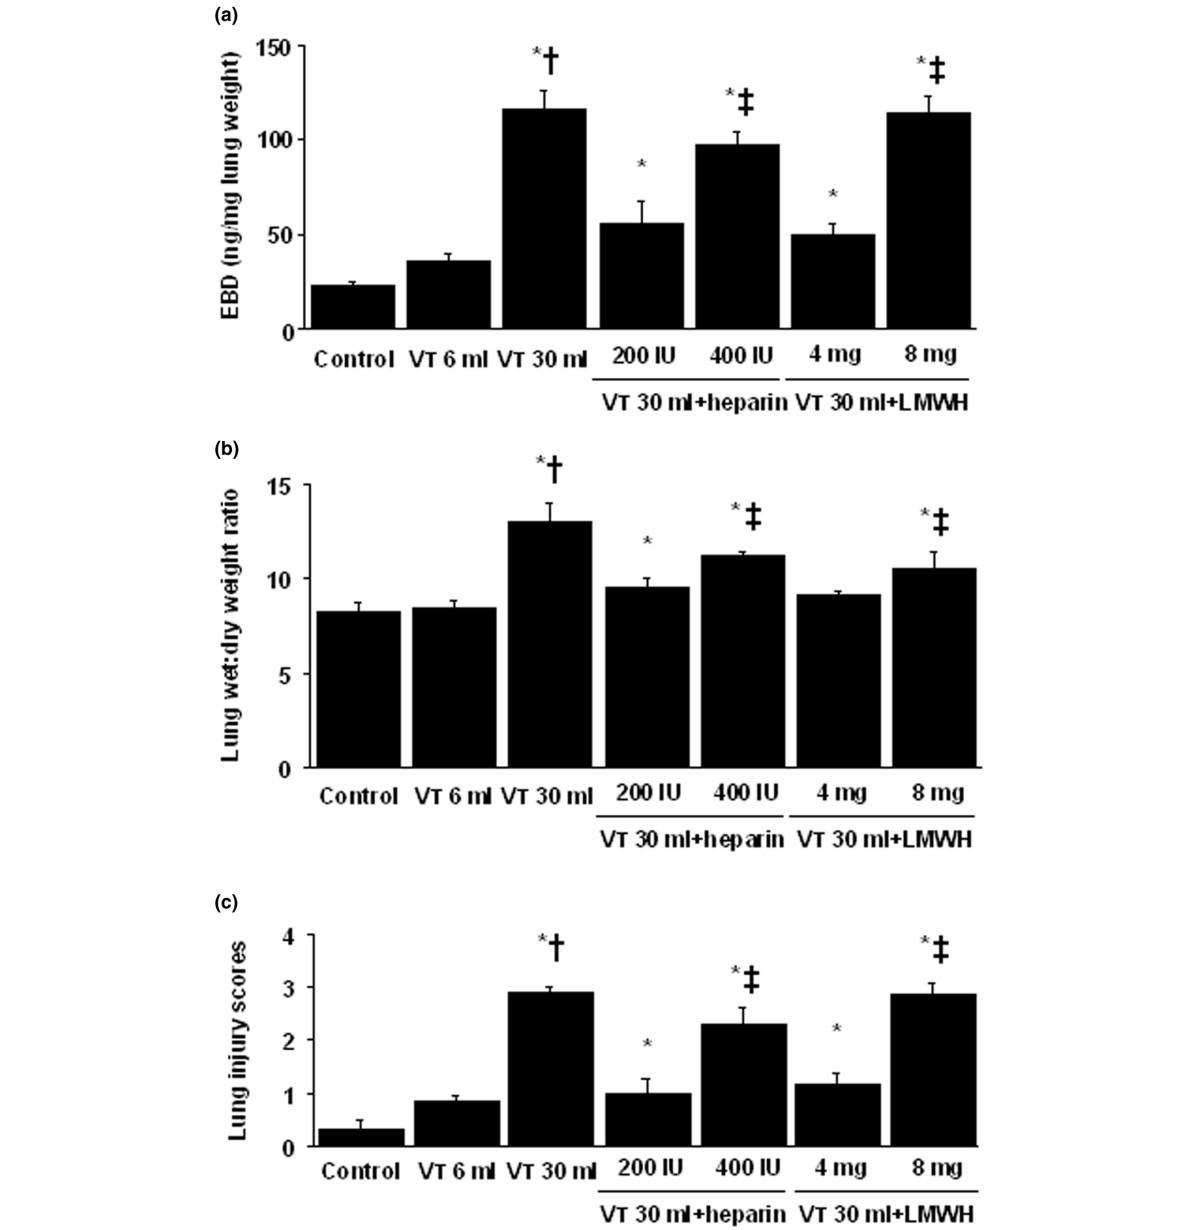 unfractionated heparin and enoxaparin reduce high